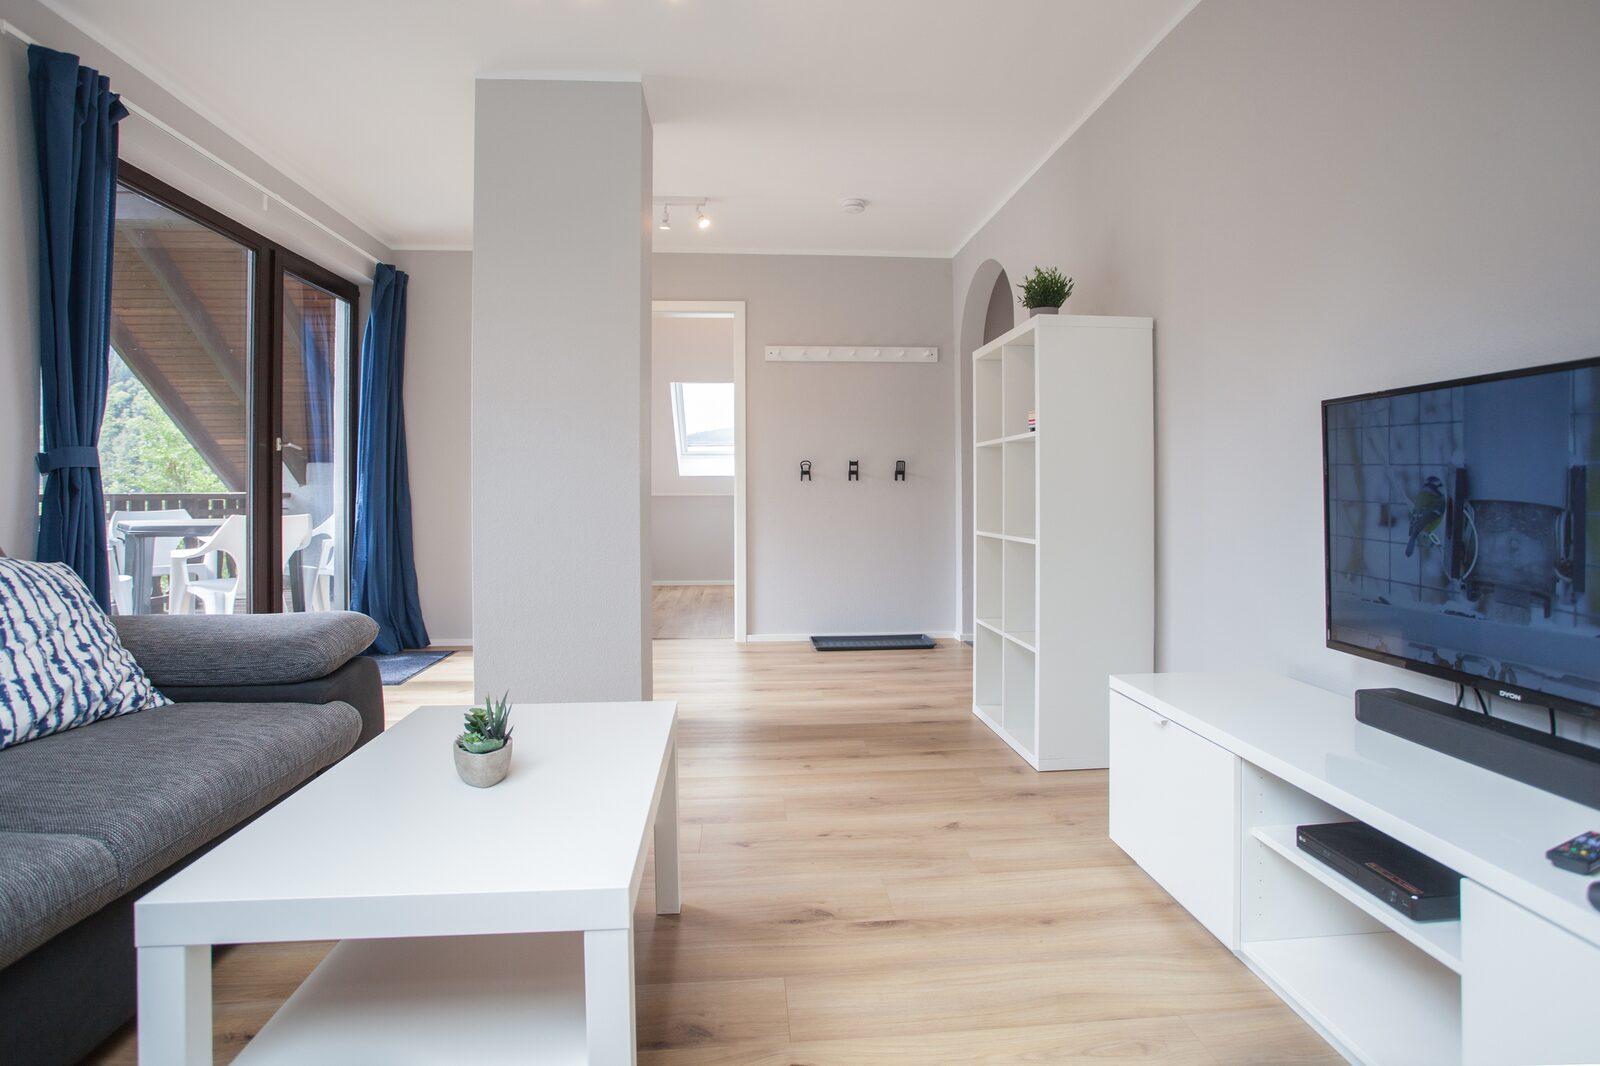 Apartment - Am Bergelchen 13-MU | Winterberg-Niedersfeld - Duitsland - Niedersfeld